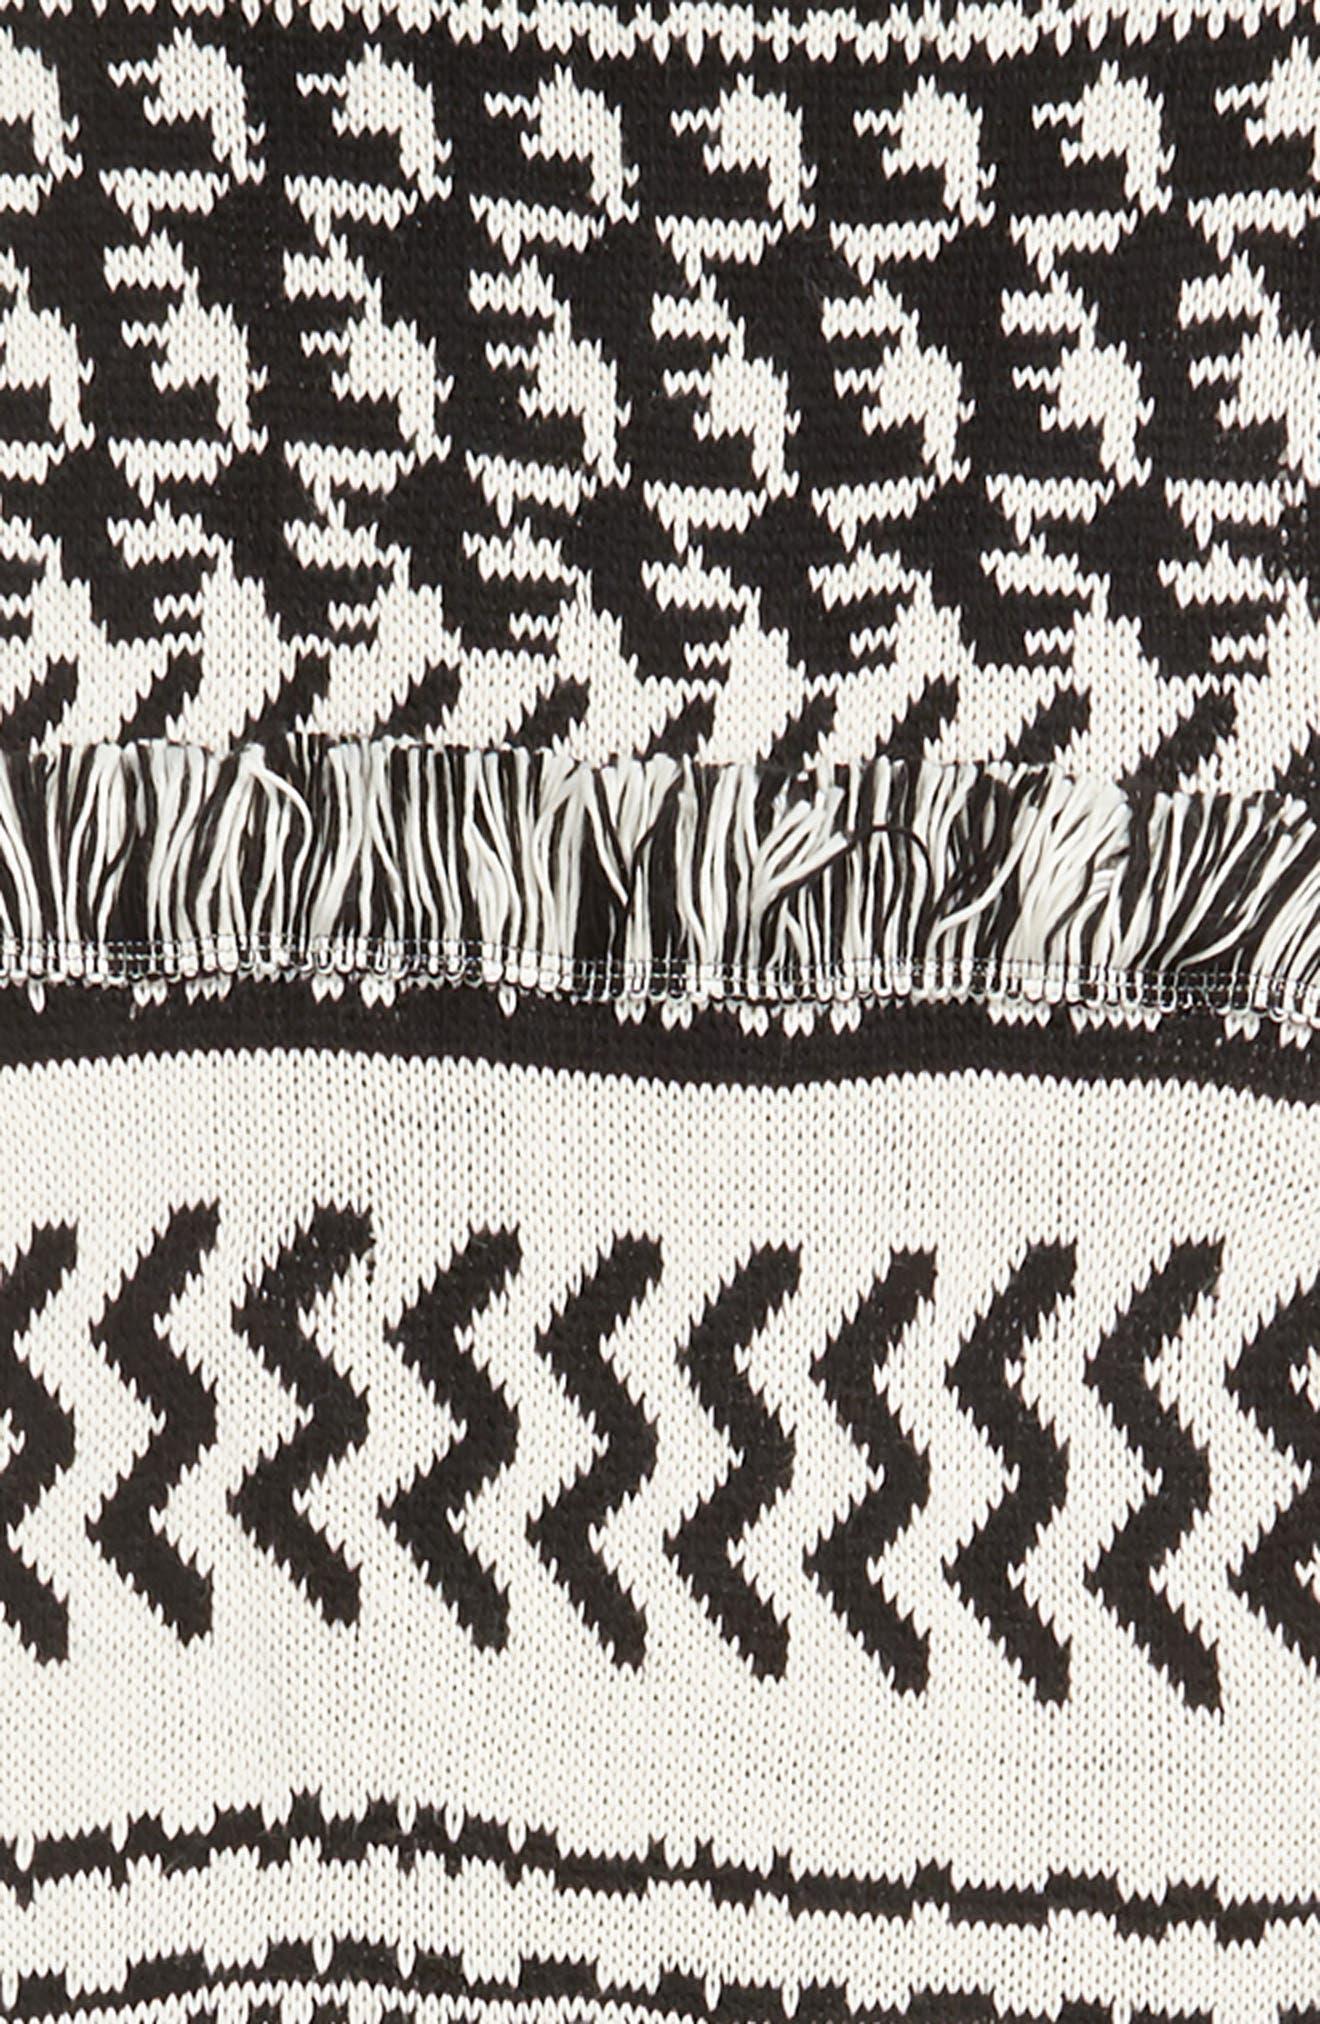 Mile High Fleece Fringe Scarf,                             Alternate thumbnail 4, color,                             BLACK AND WHITE COMBO